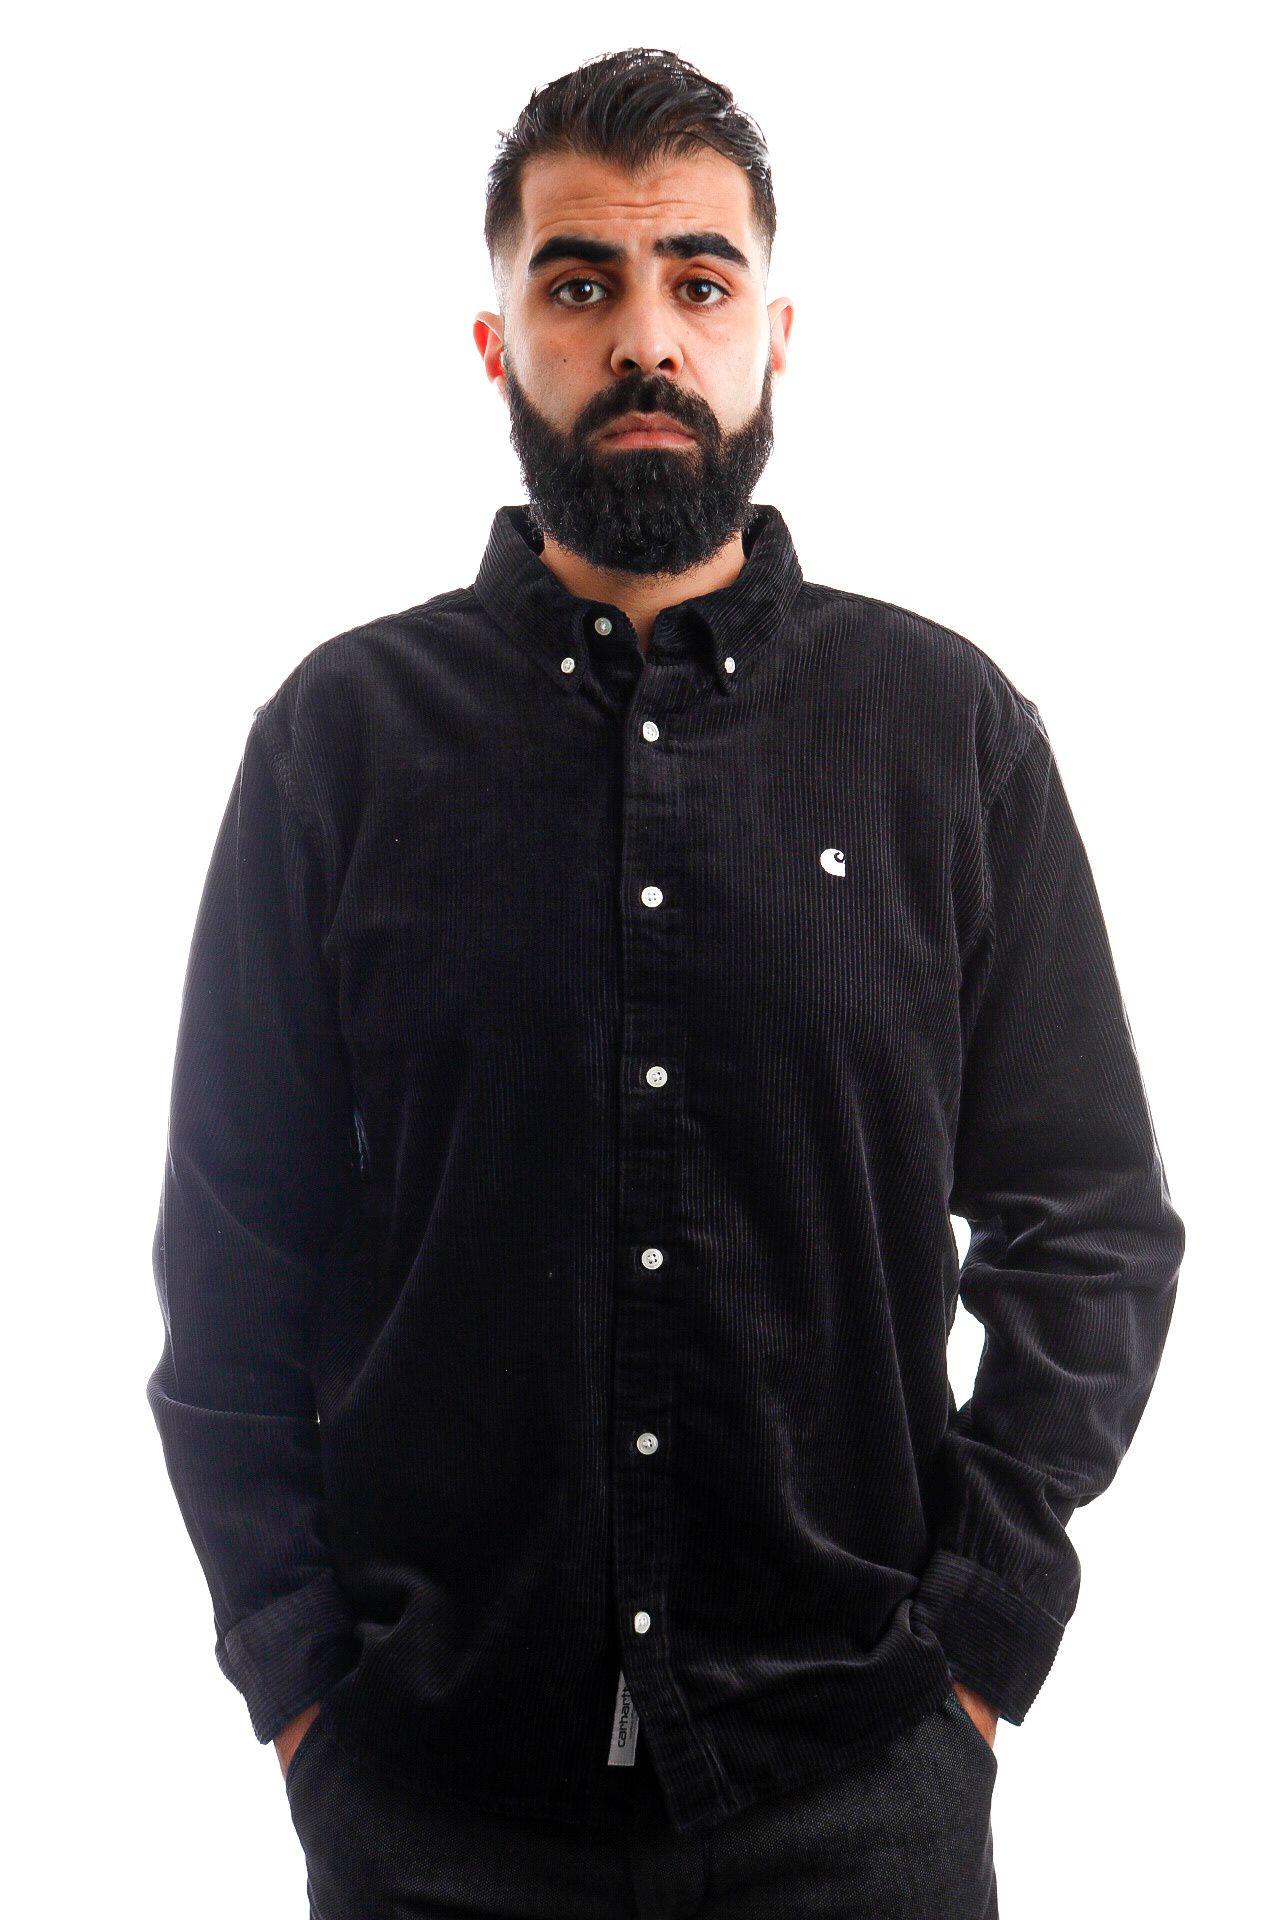 Afbeelding van Carhartt Blouse L/S Madison Cord Shirt Black / Wax I029958